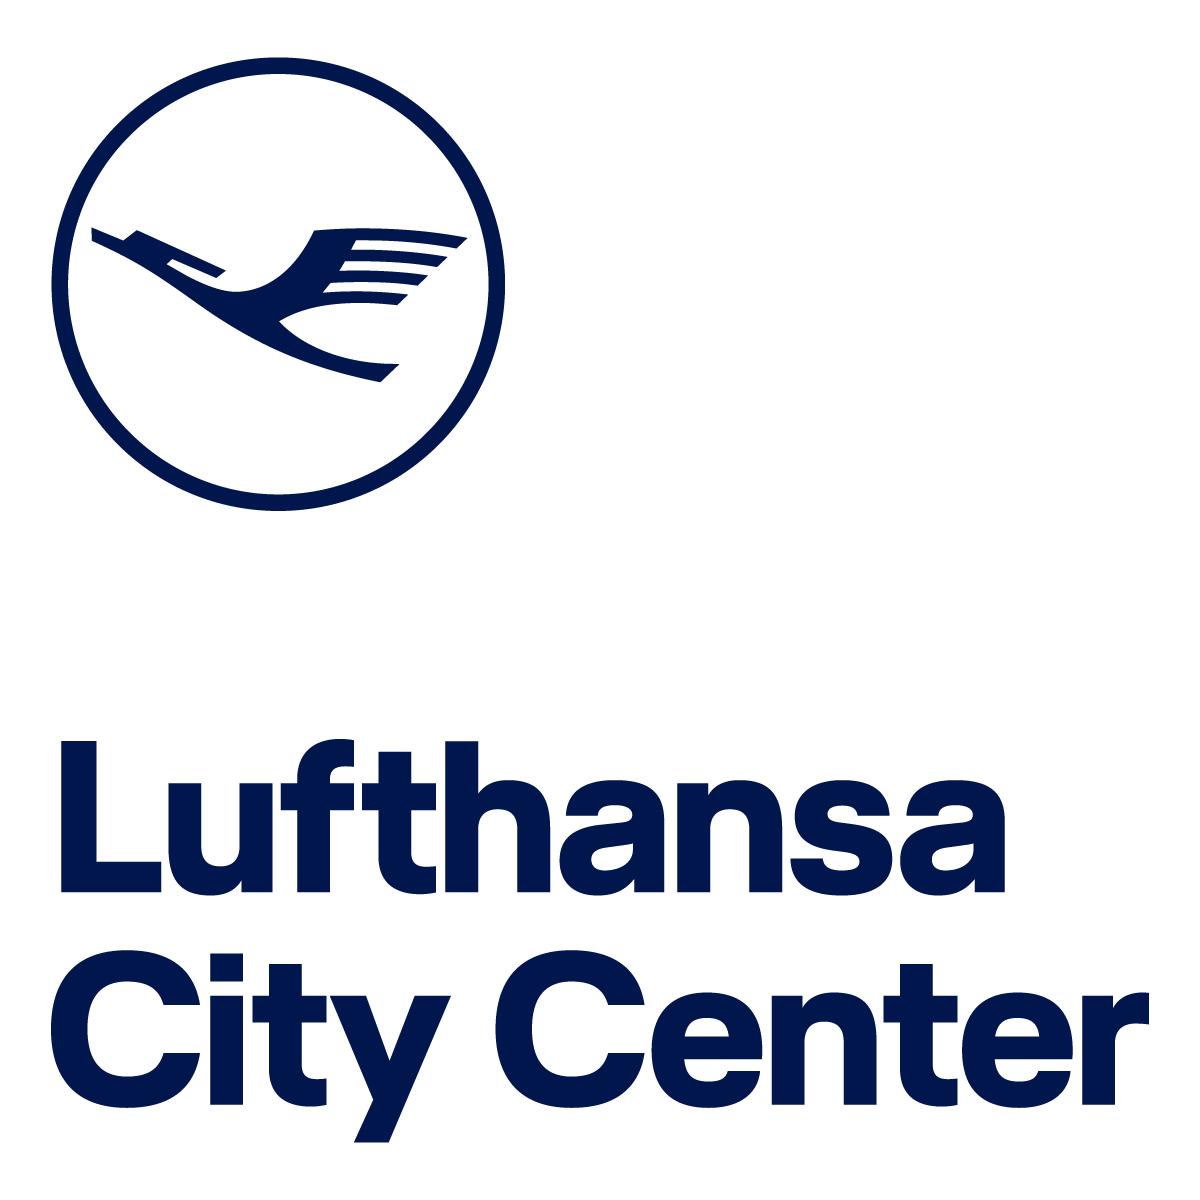 Reisebüro Daniel Plum Lufthansa City Center Kaarst